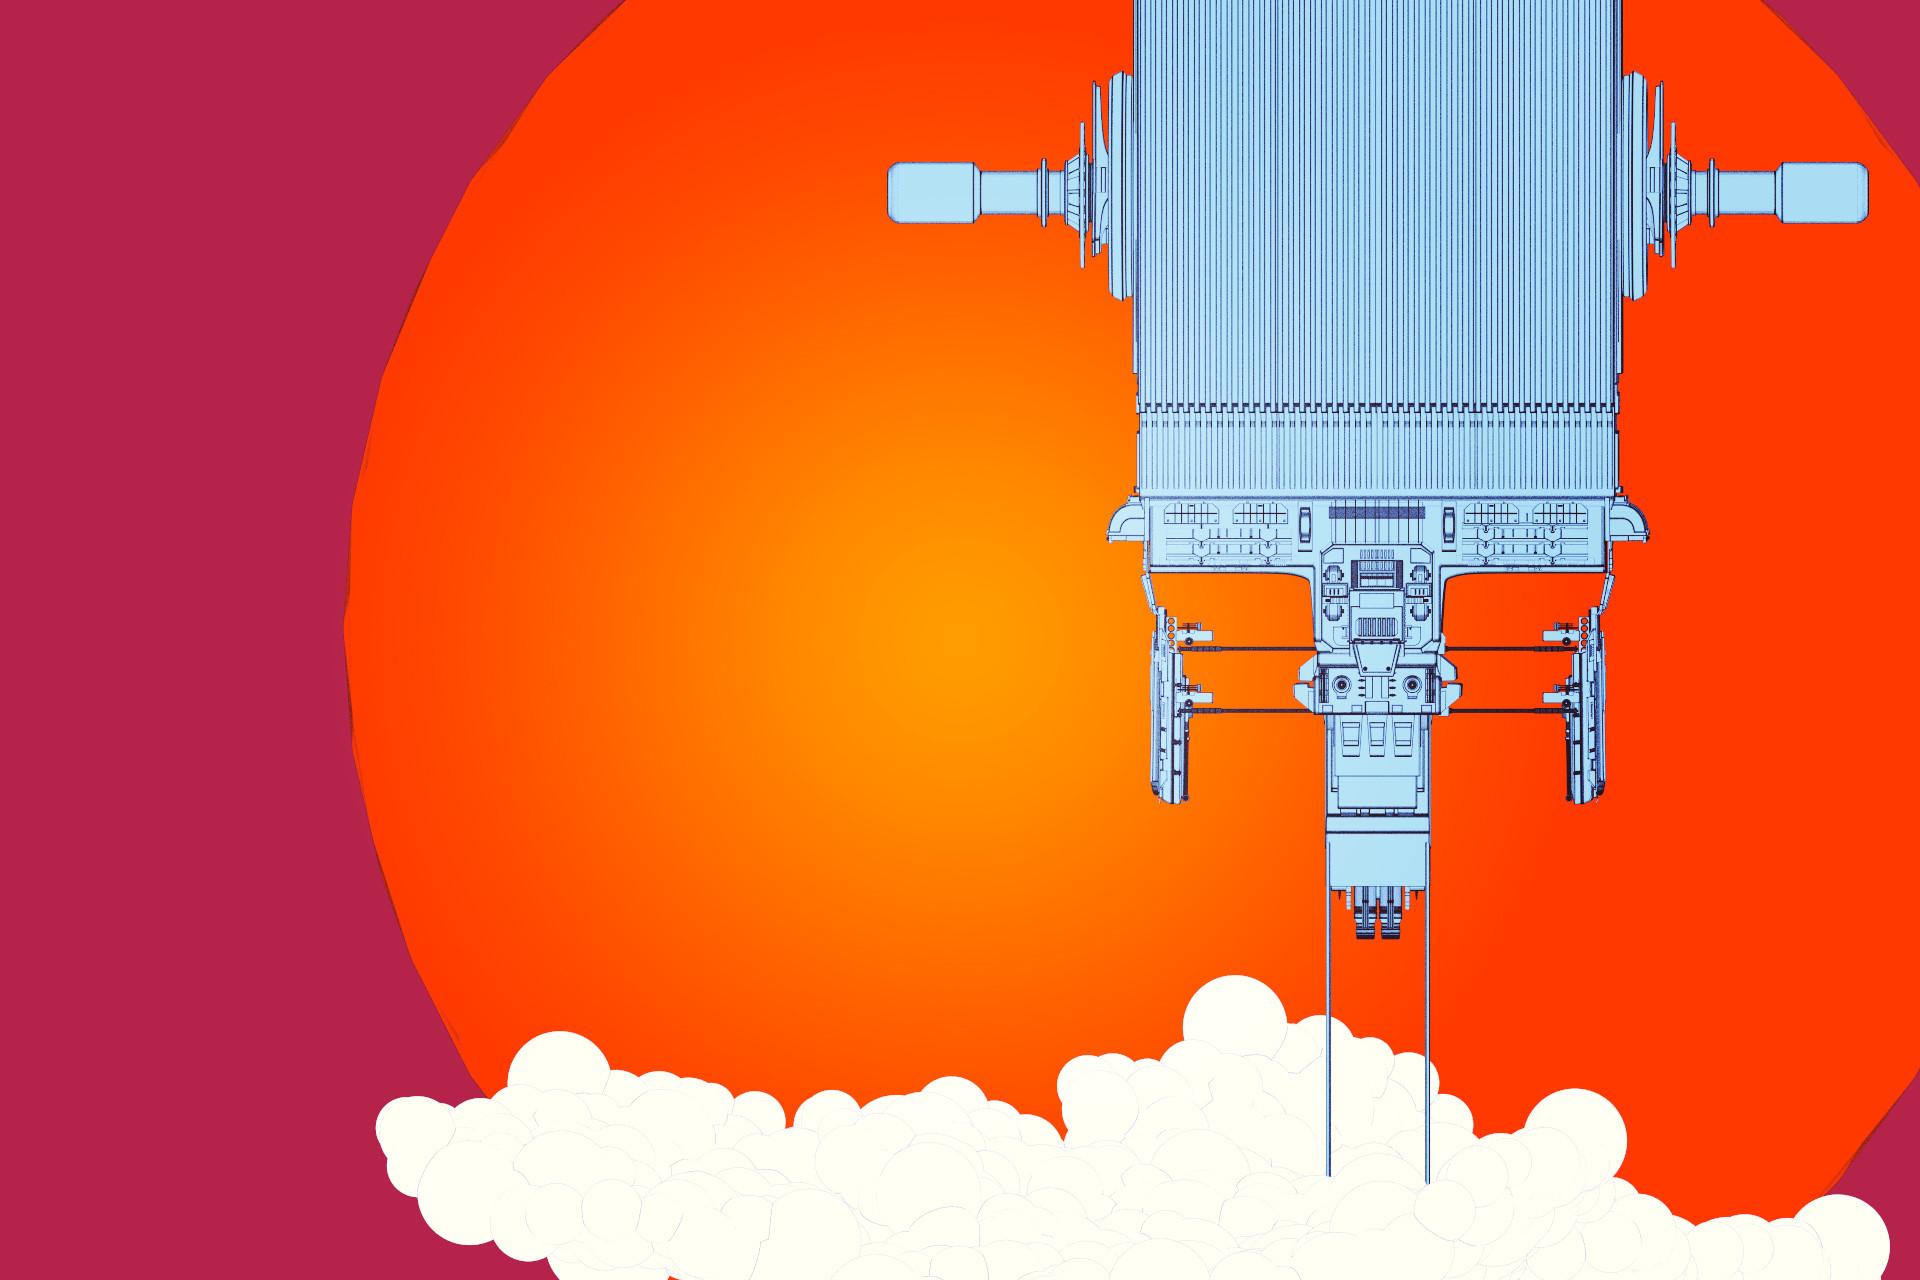 Ben nicholas atmosphereprocessor 03